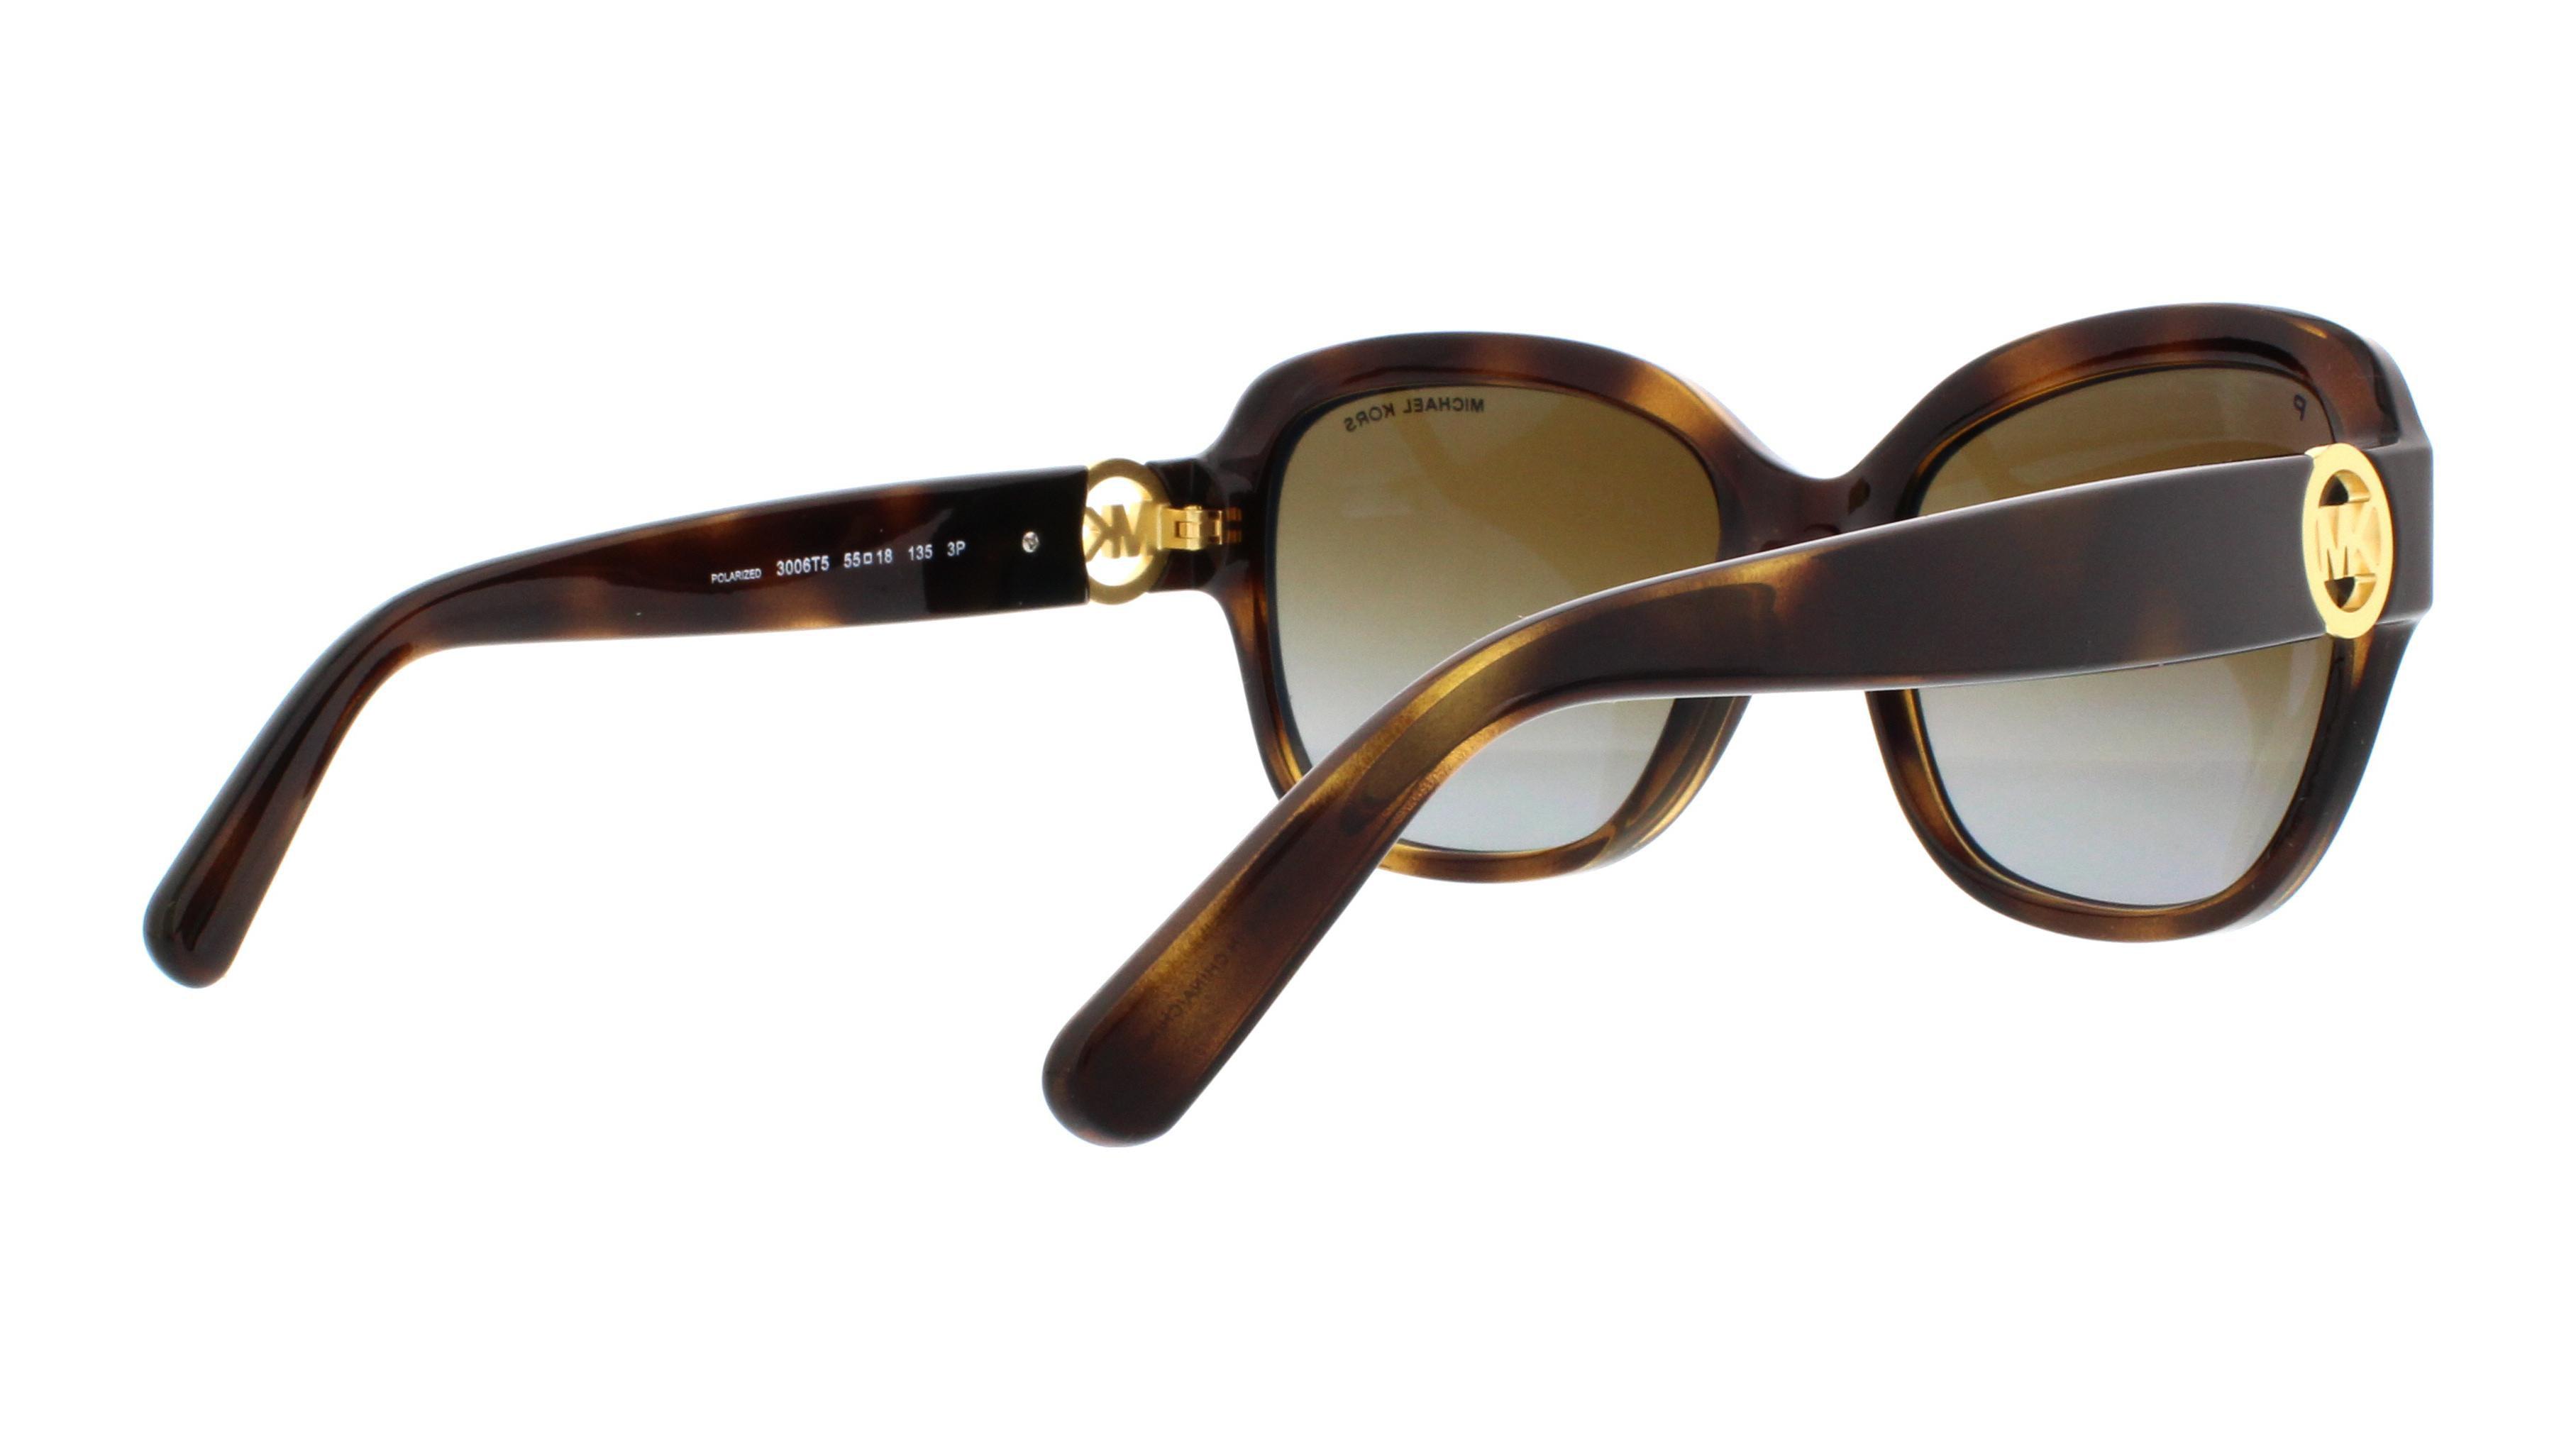 23912723b4 Michael Kors - MICHAEL KORS Sunglasses MK 6027 3006T5 Dark Tortoise 55MM -  Walmart.com